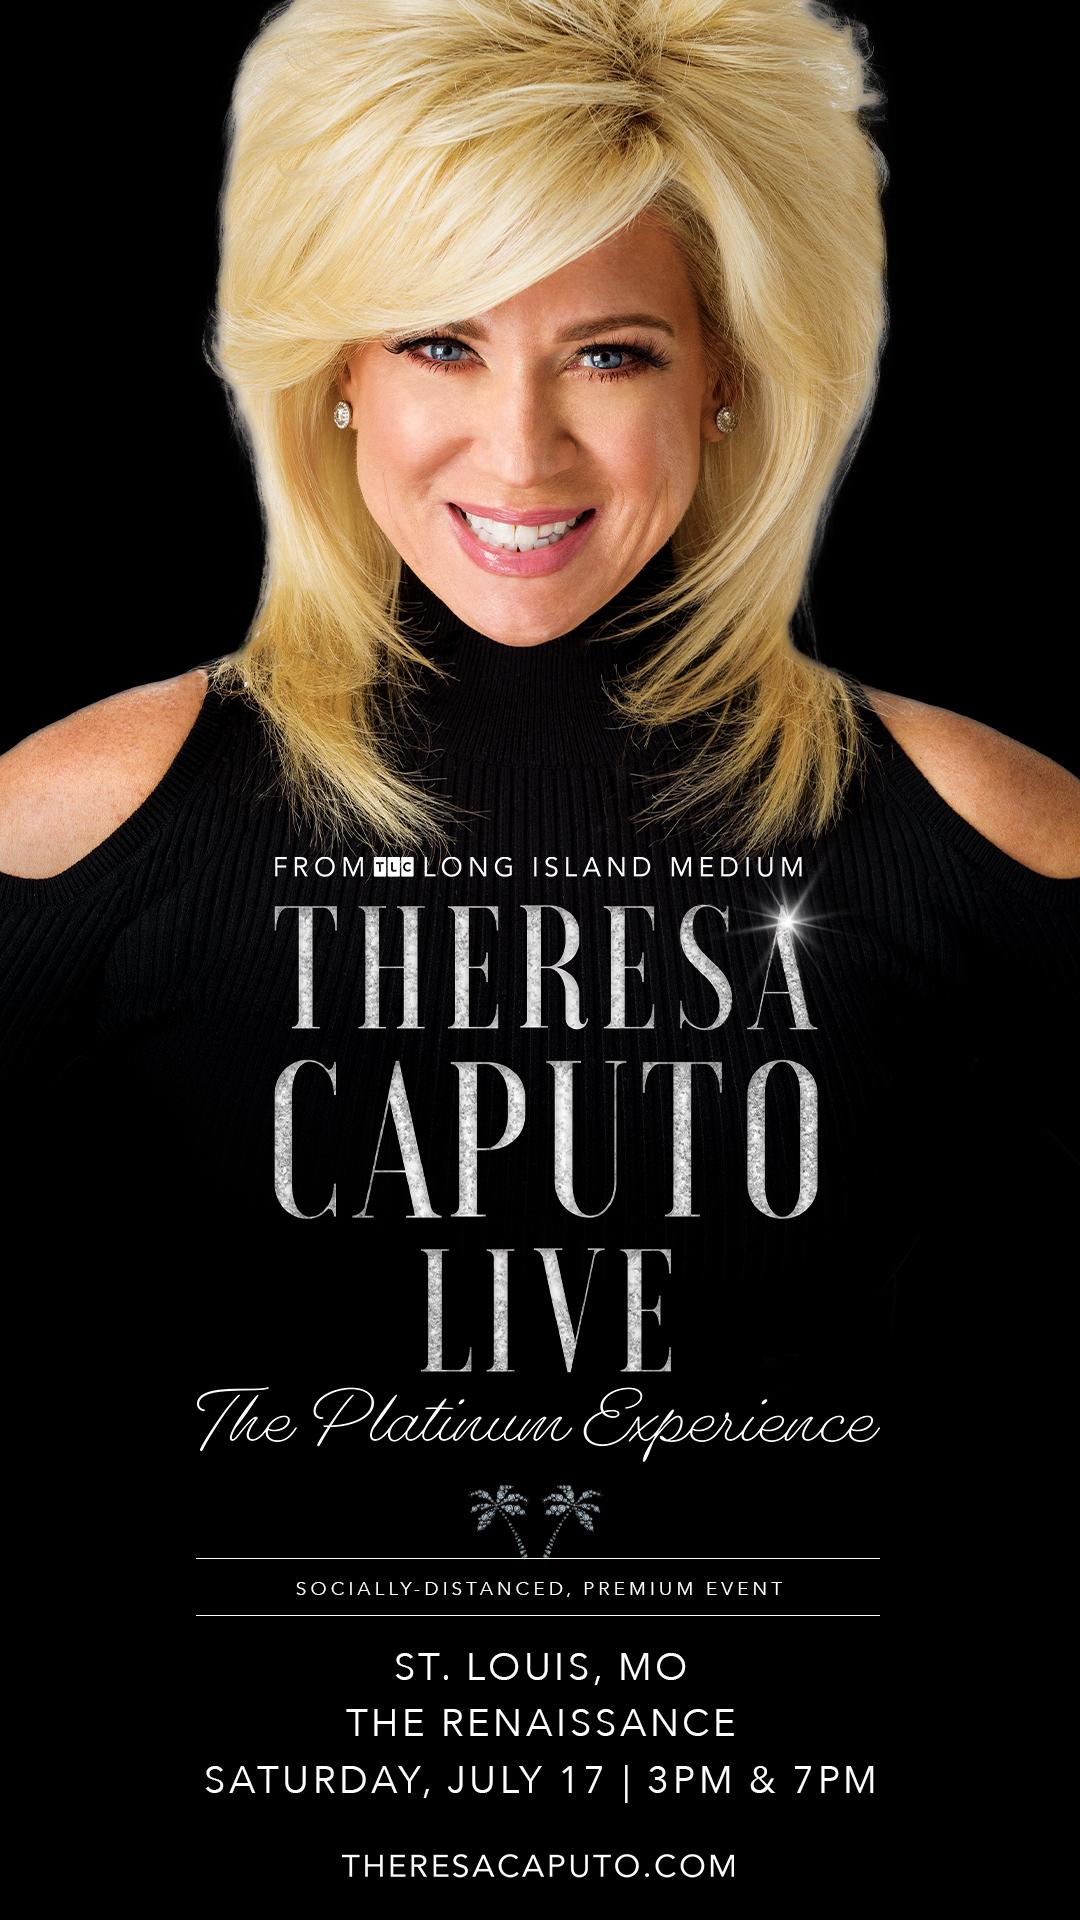 Poster image of Theresa Caputo. Theresa Caputo Live, The Platinum Experience. Socially Distanced, Premium Event.